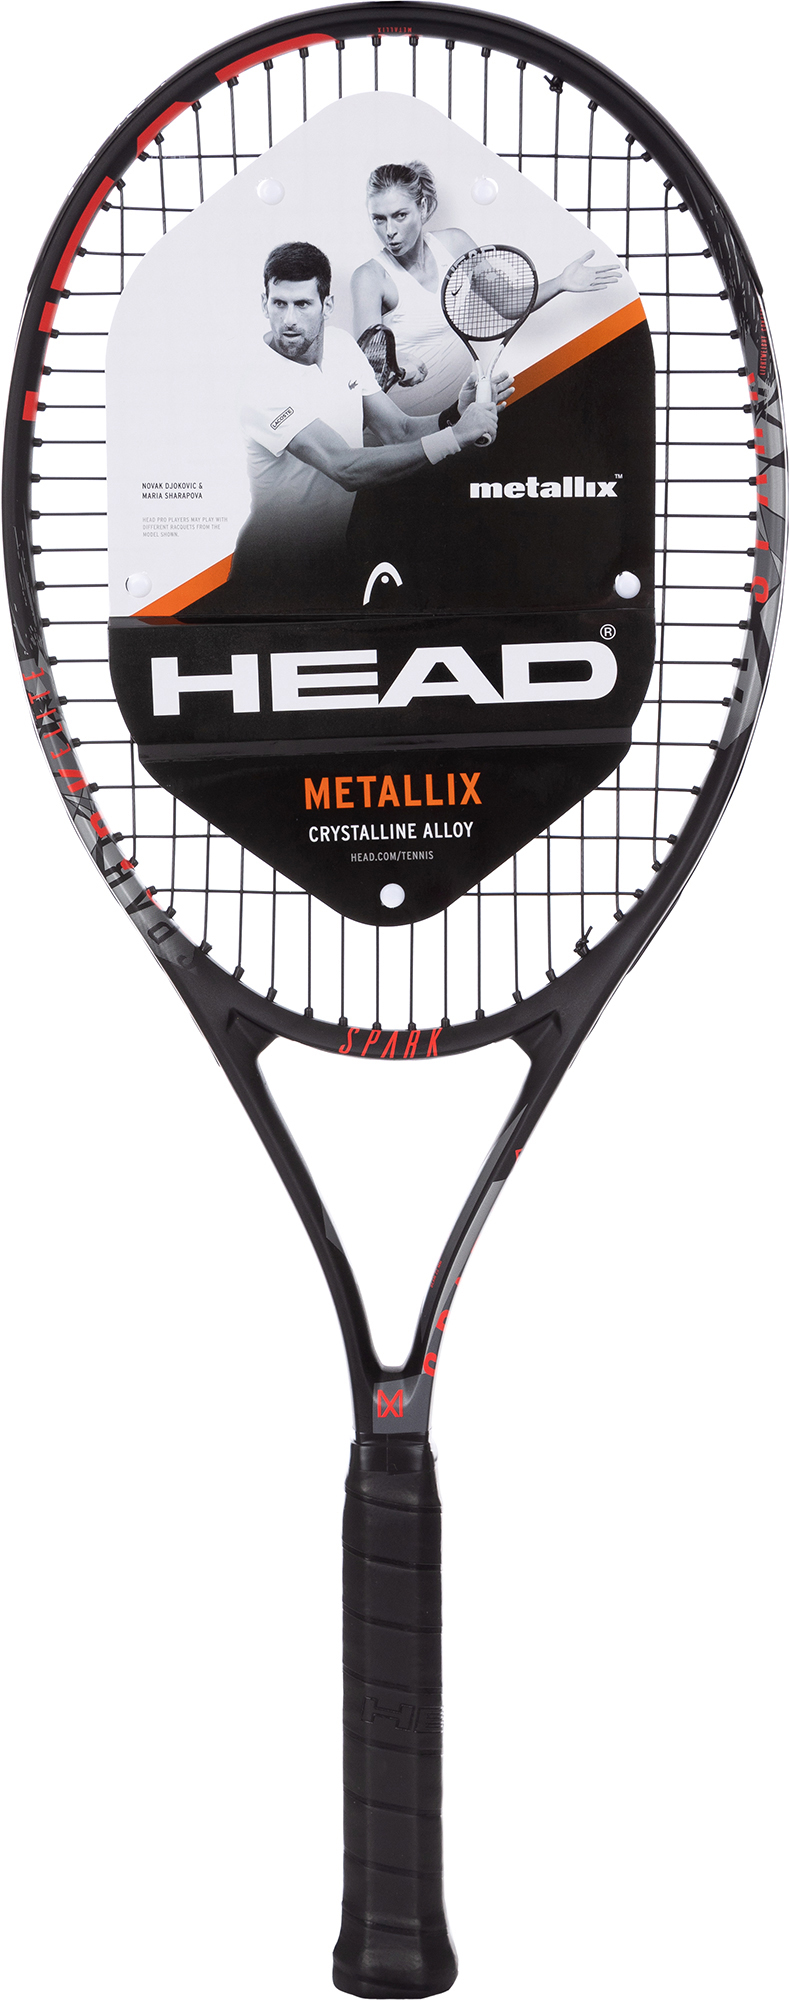 Head Ракетка для большого тенниса Head MX Spark Elite 27 head ракетка для большого тенниса head graphene 360 speed lite 27